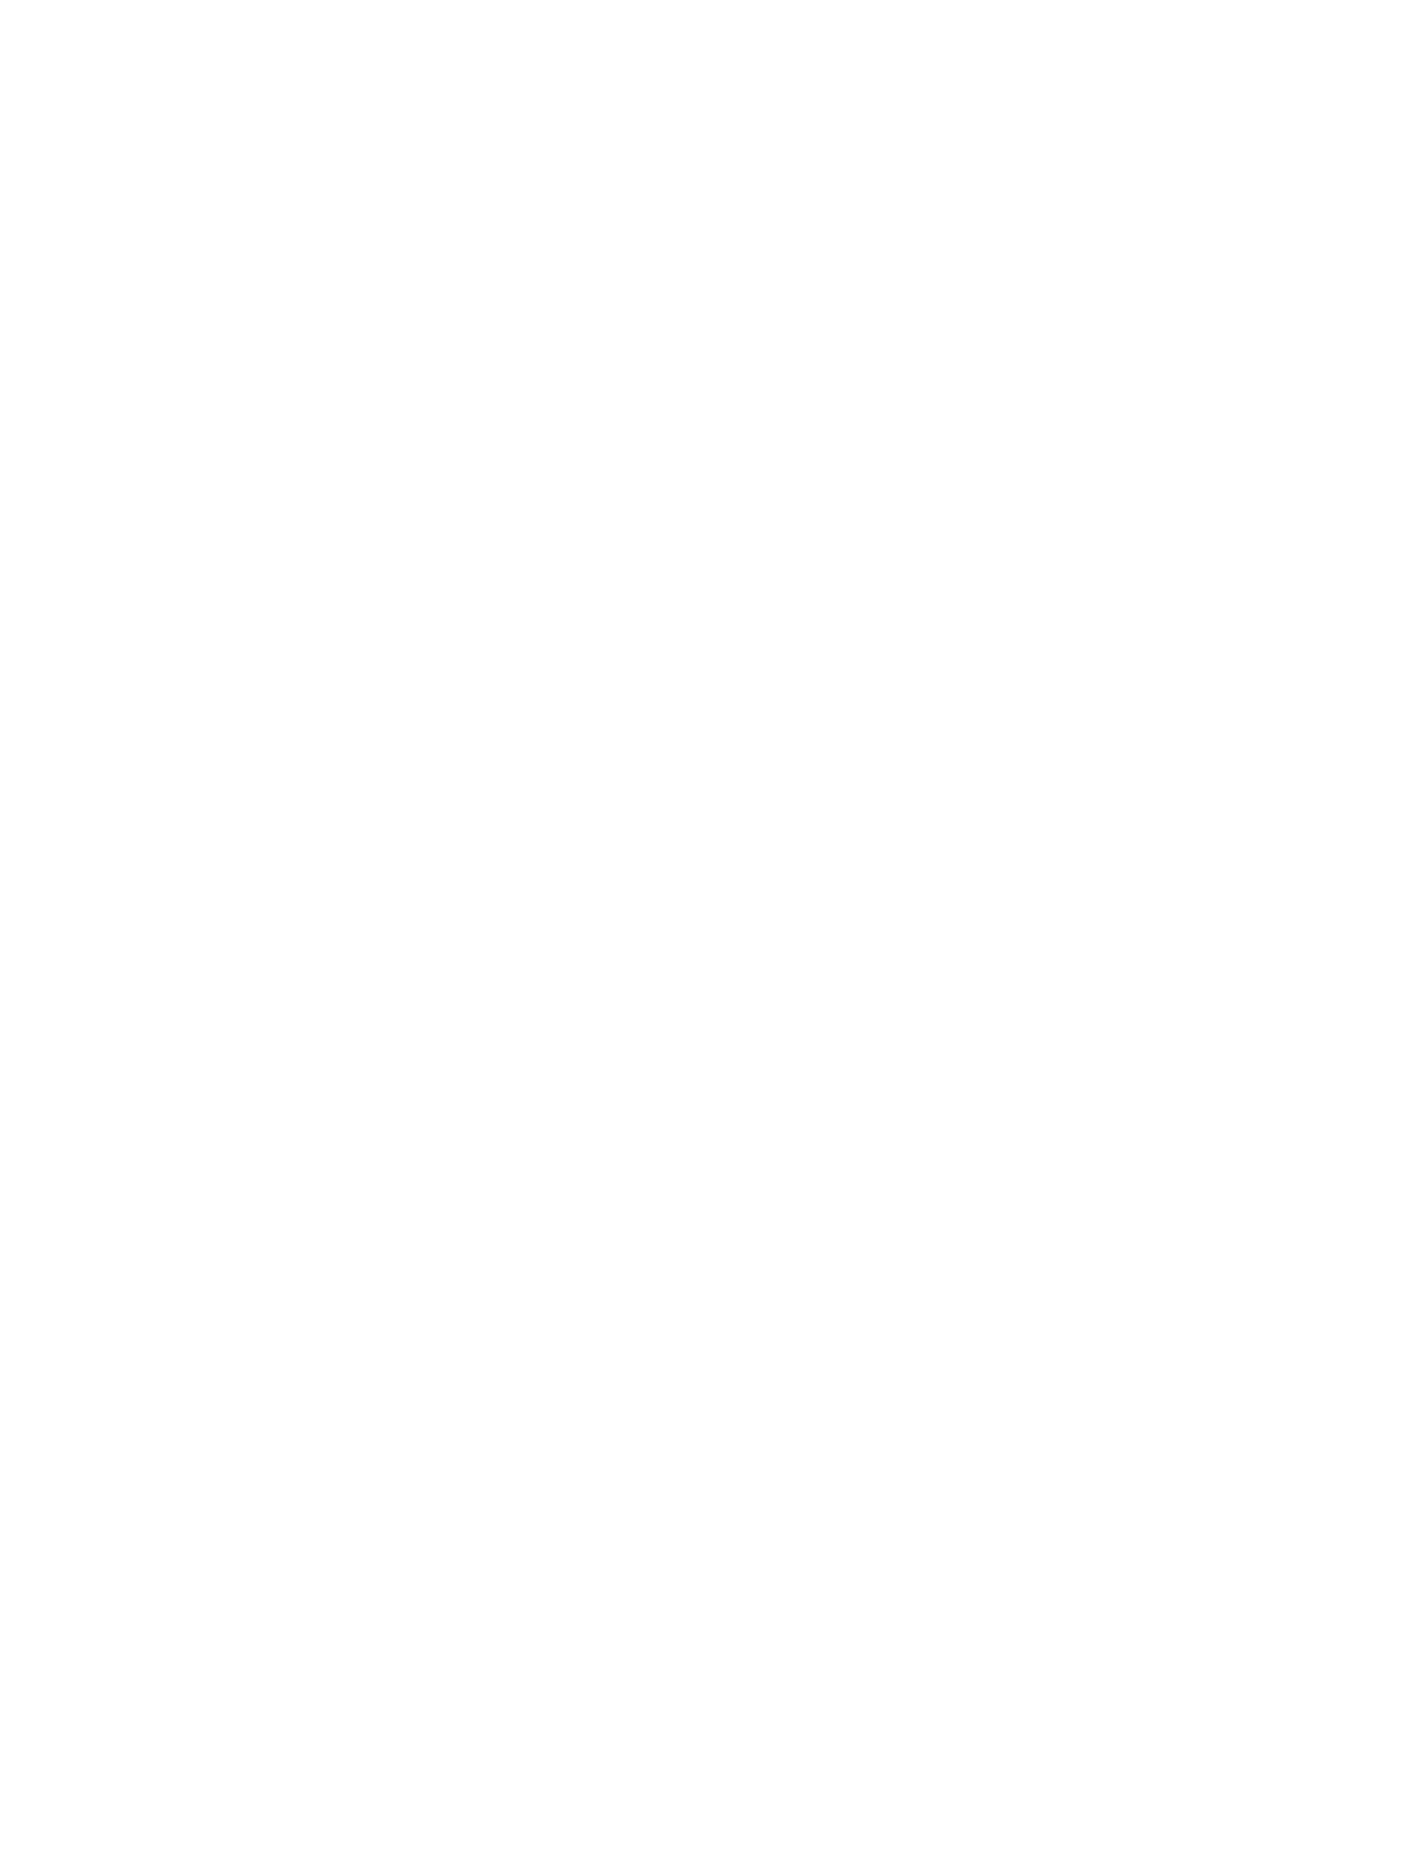 Трусы стринг vendetta londonБюстье<br>трусы<br><br>Цвет: Красный<br>Декор: None<br>Стилистика: None<br>Направление: Бюстье<br>Пол: Женский<br>Материал: 64%ПА; 22%ЭЛ; 14%ХЛ<br>Размер RU: 44